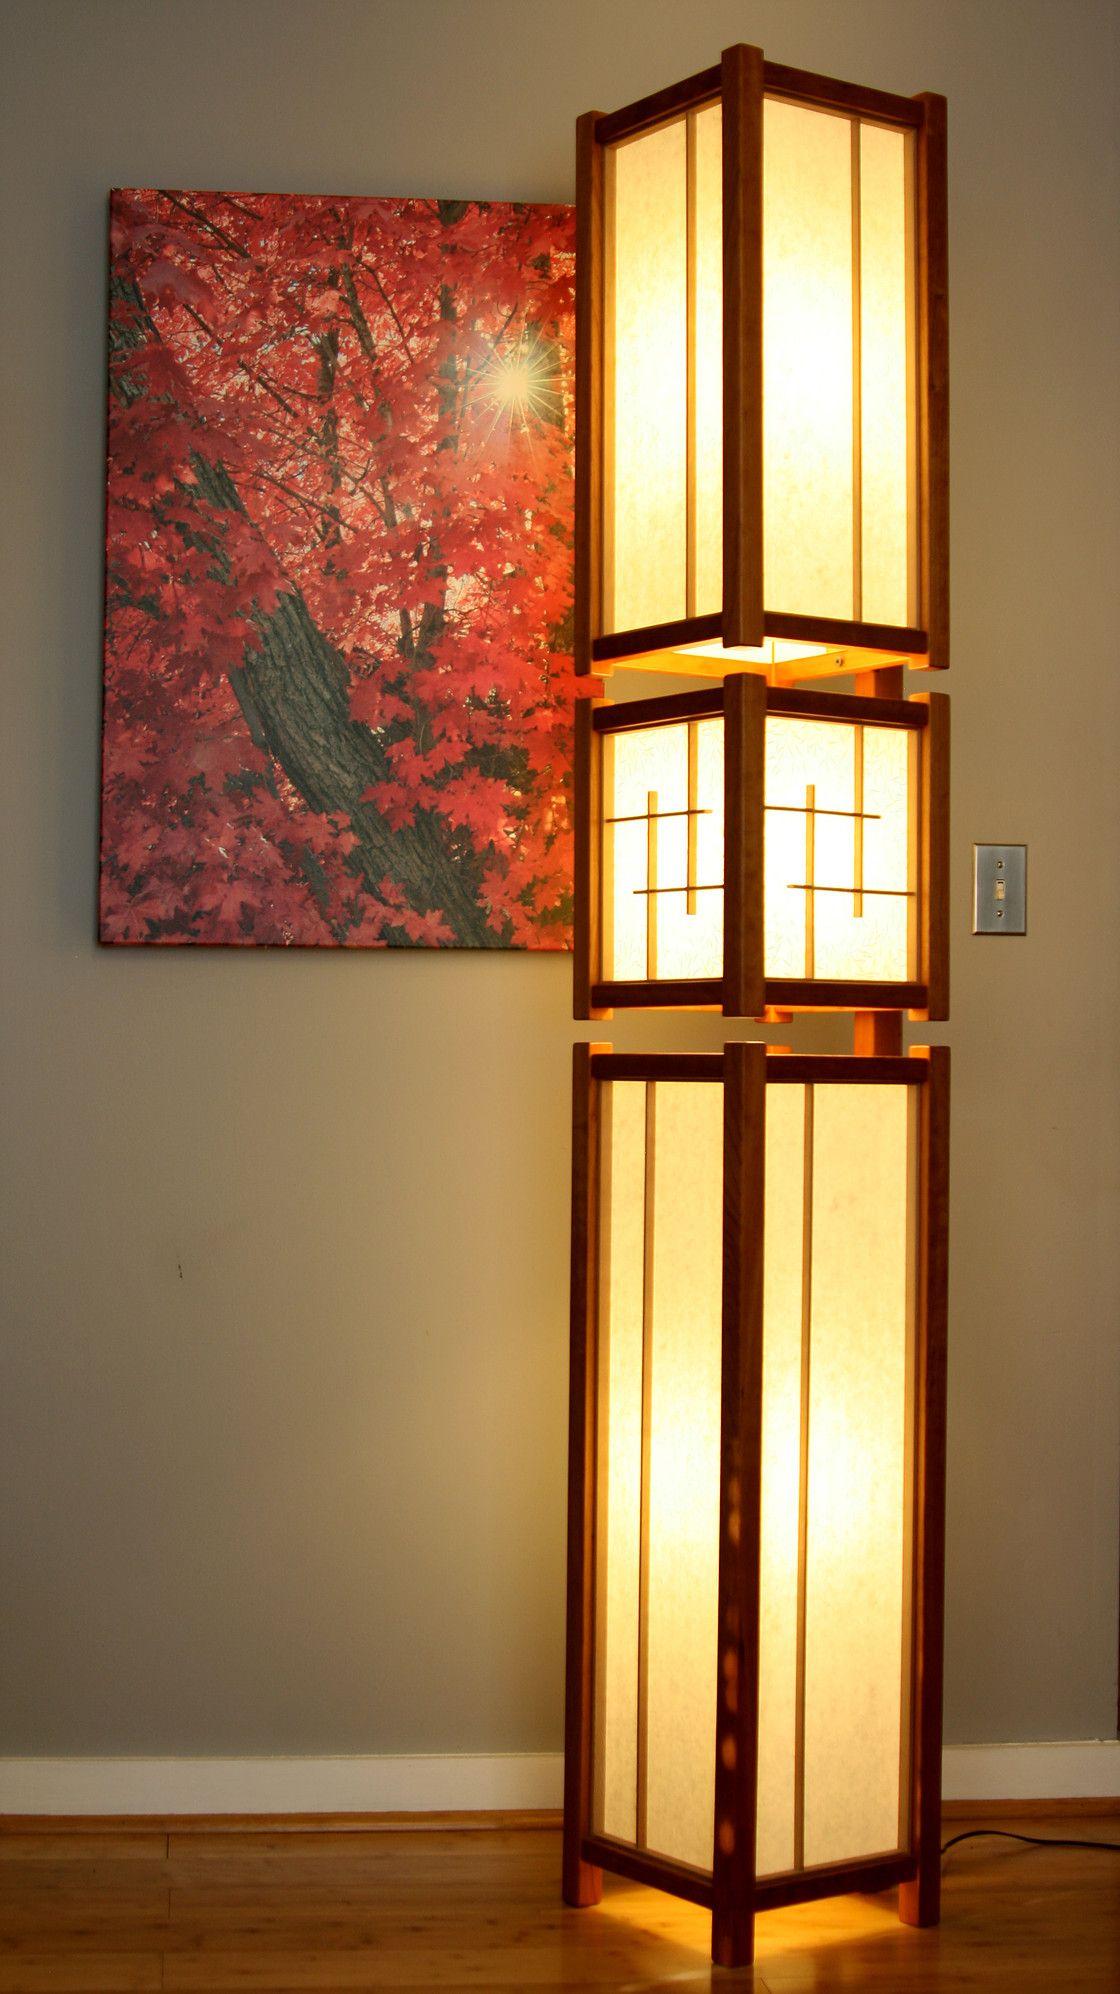 Japanese Inspired Floor Lamp Wooden Lamps Design Lamp Floor Lamp Design